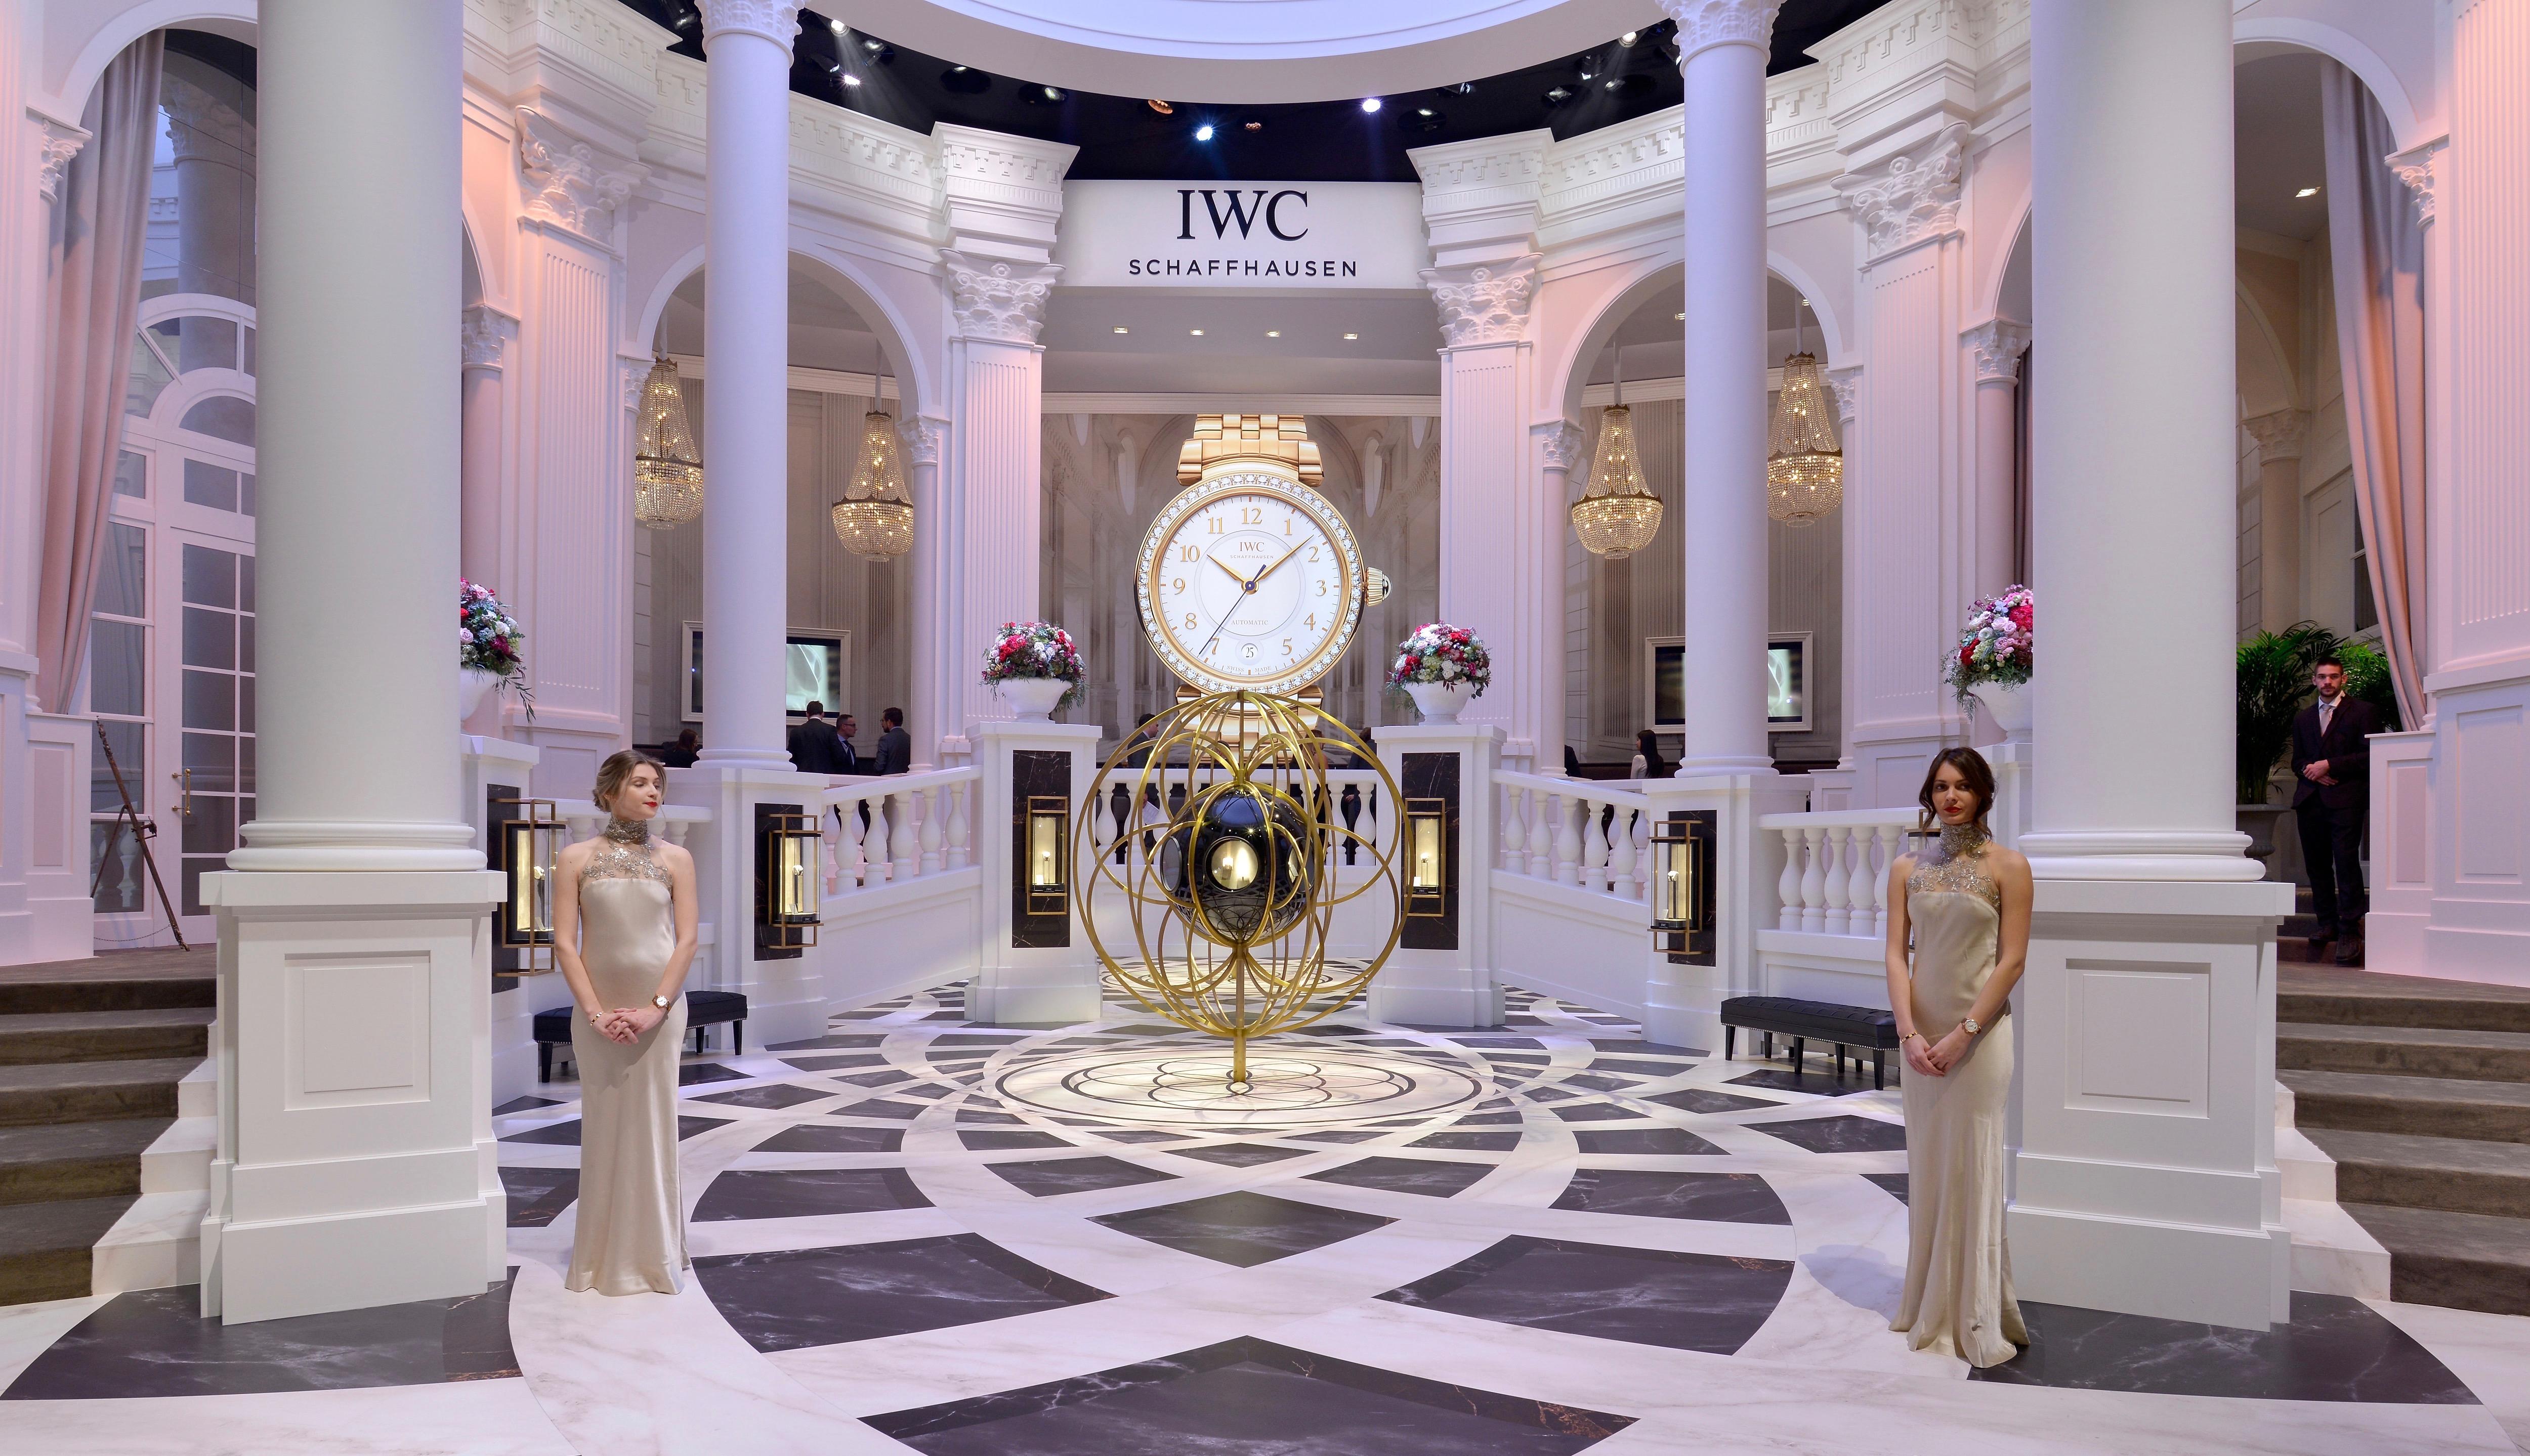 IWC DA VINCI   SIHH 2017 - Blog - Alexandra Lapp